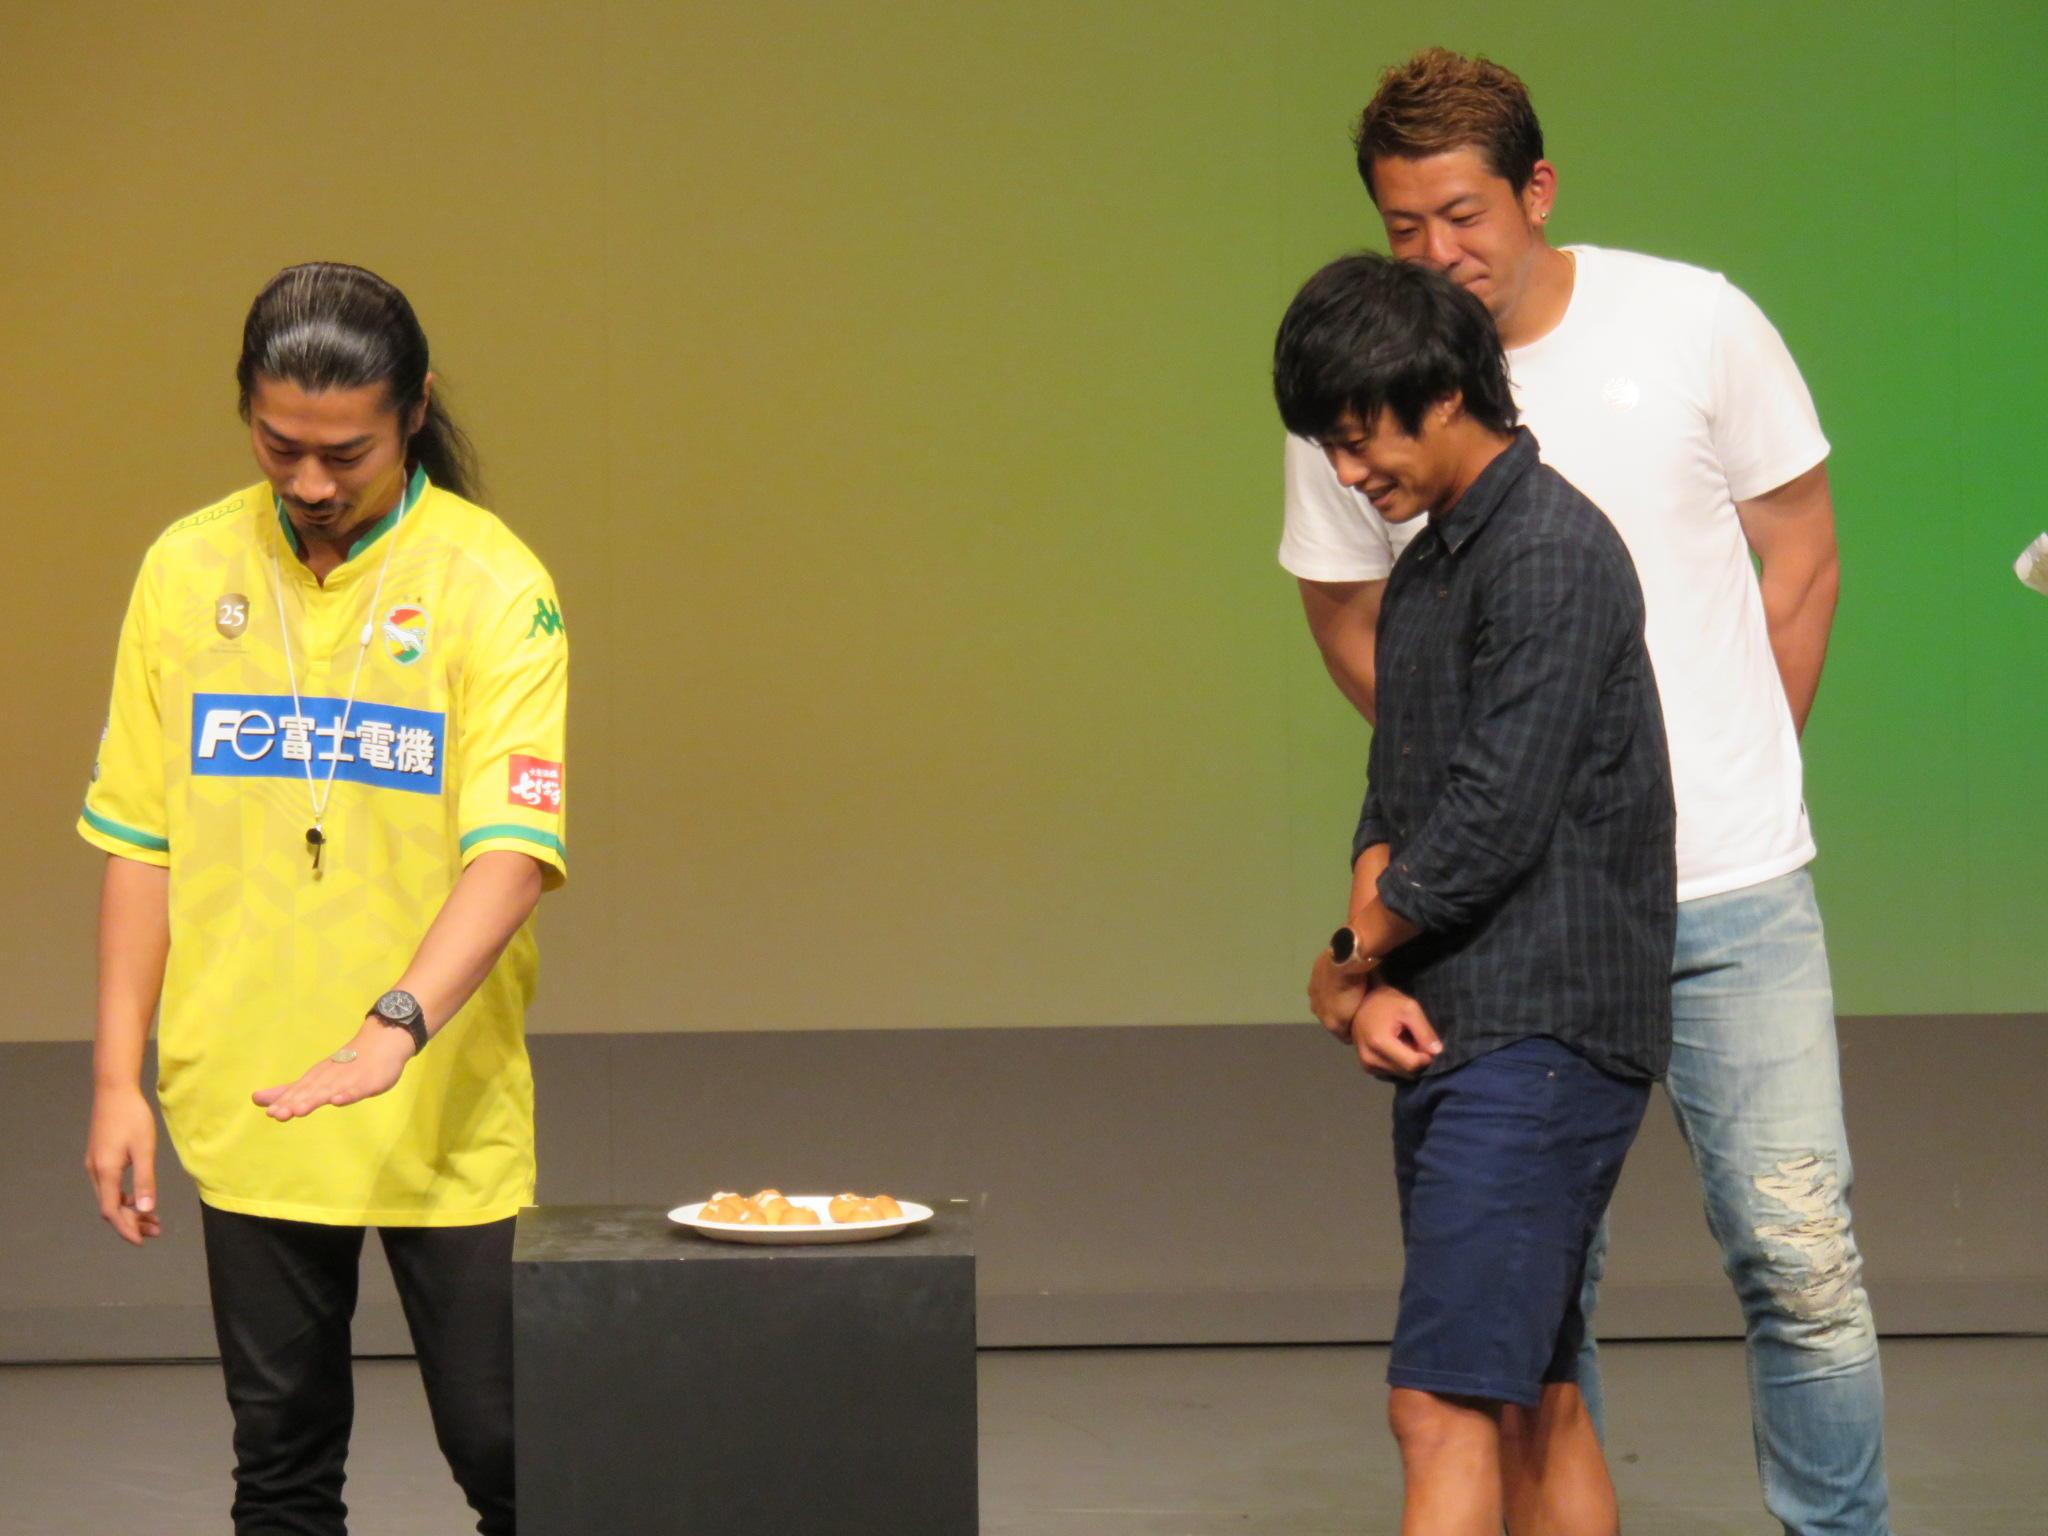 http://news.yoshimoto.co.jp/20160830230417-d206f7148360ac2c882efb01075a4d60880b4768.jpg